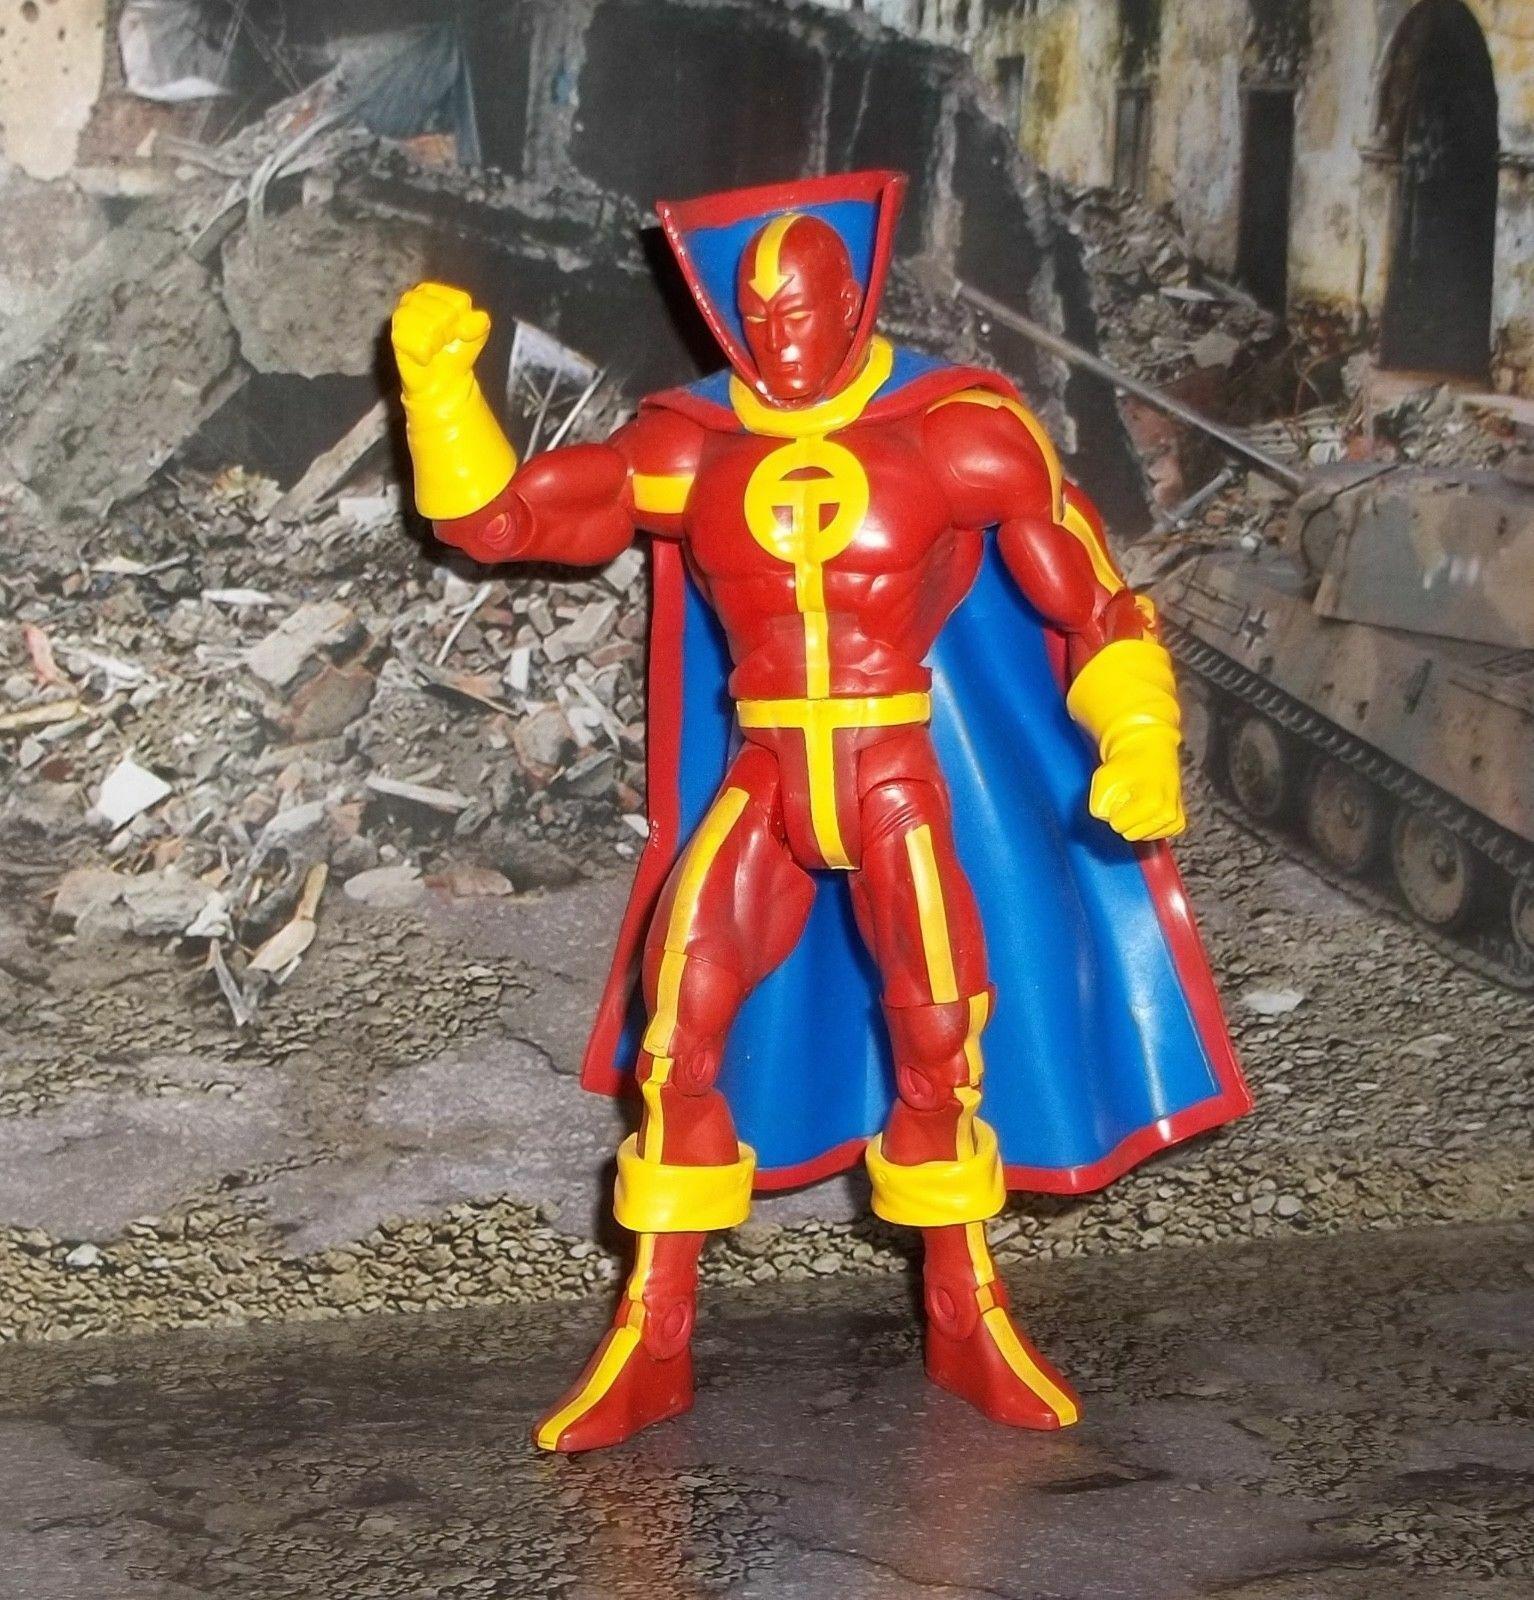 DC UNIVERSE CLASSICS WAVE 1 JUSTICE LEAGUE RED TORNADO FIGURE